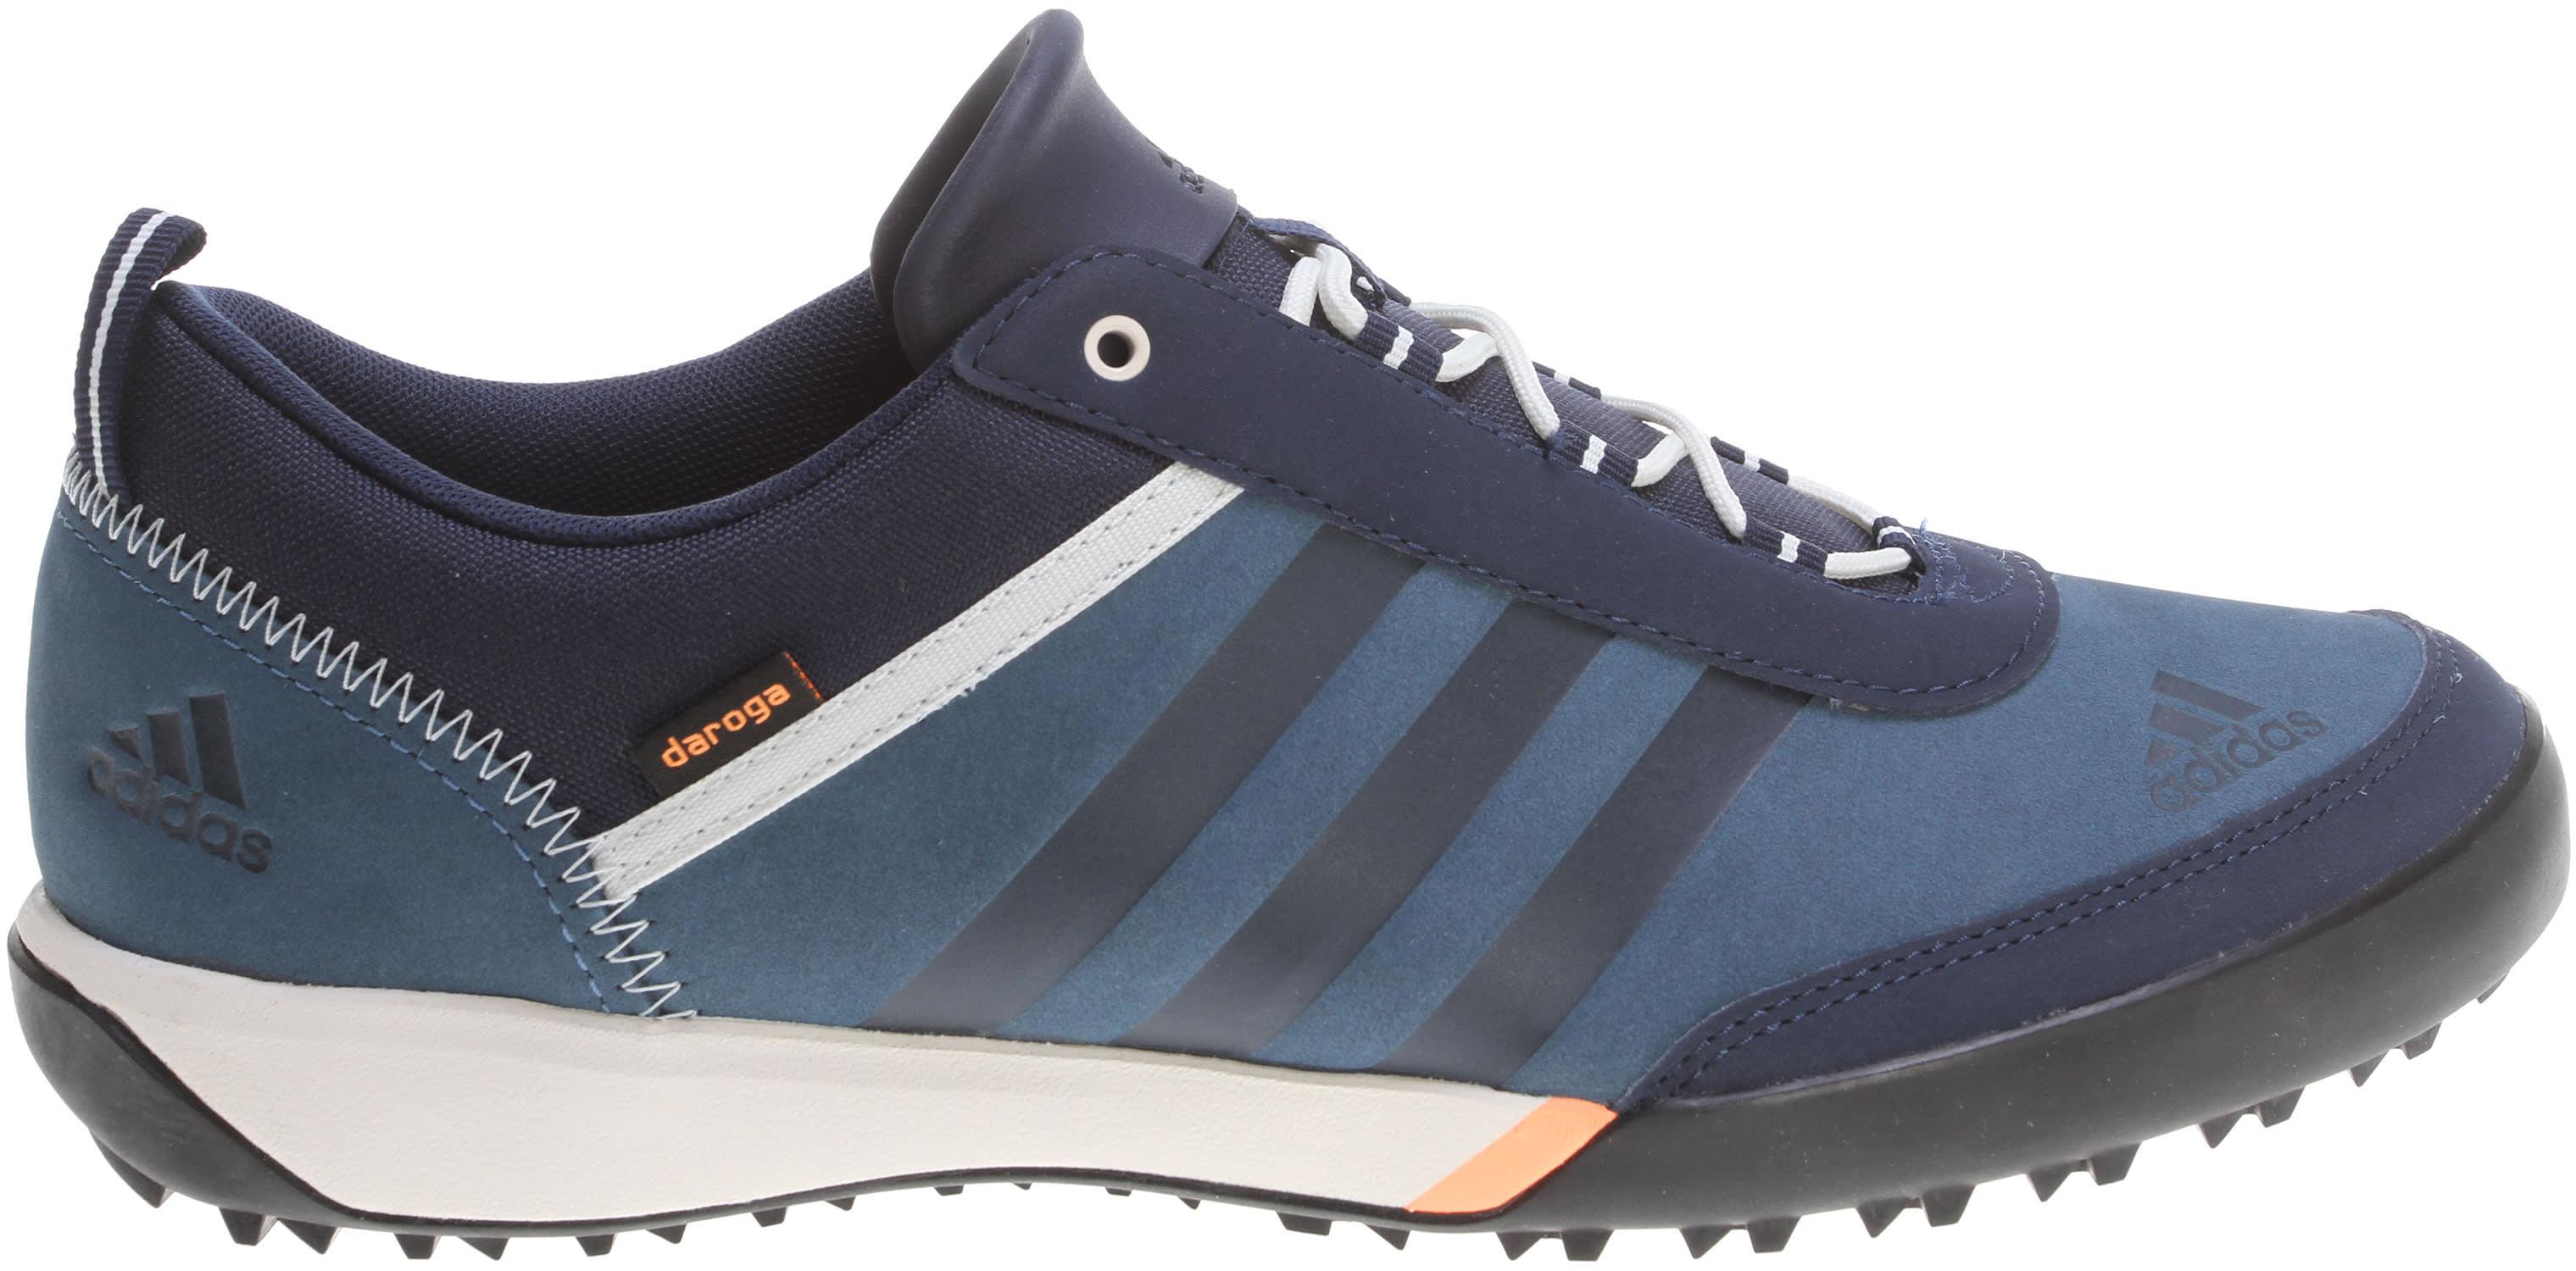 Adidas Daroga Sleek Hiking Shoes - Womens